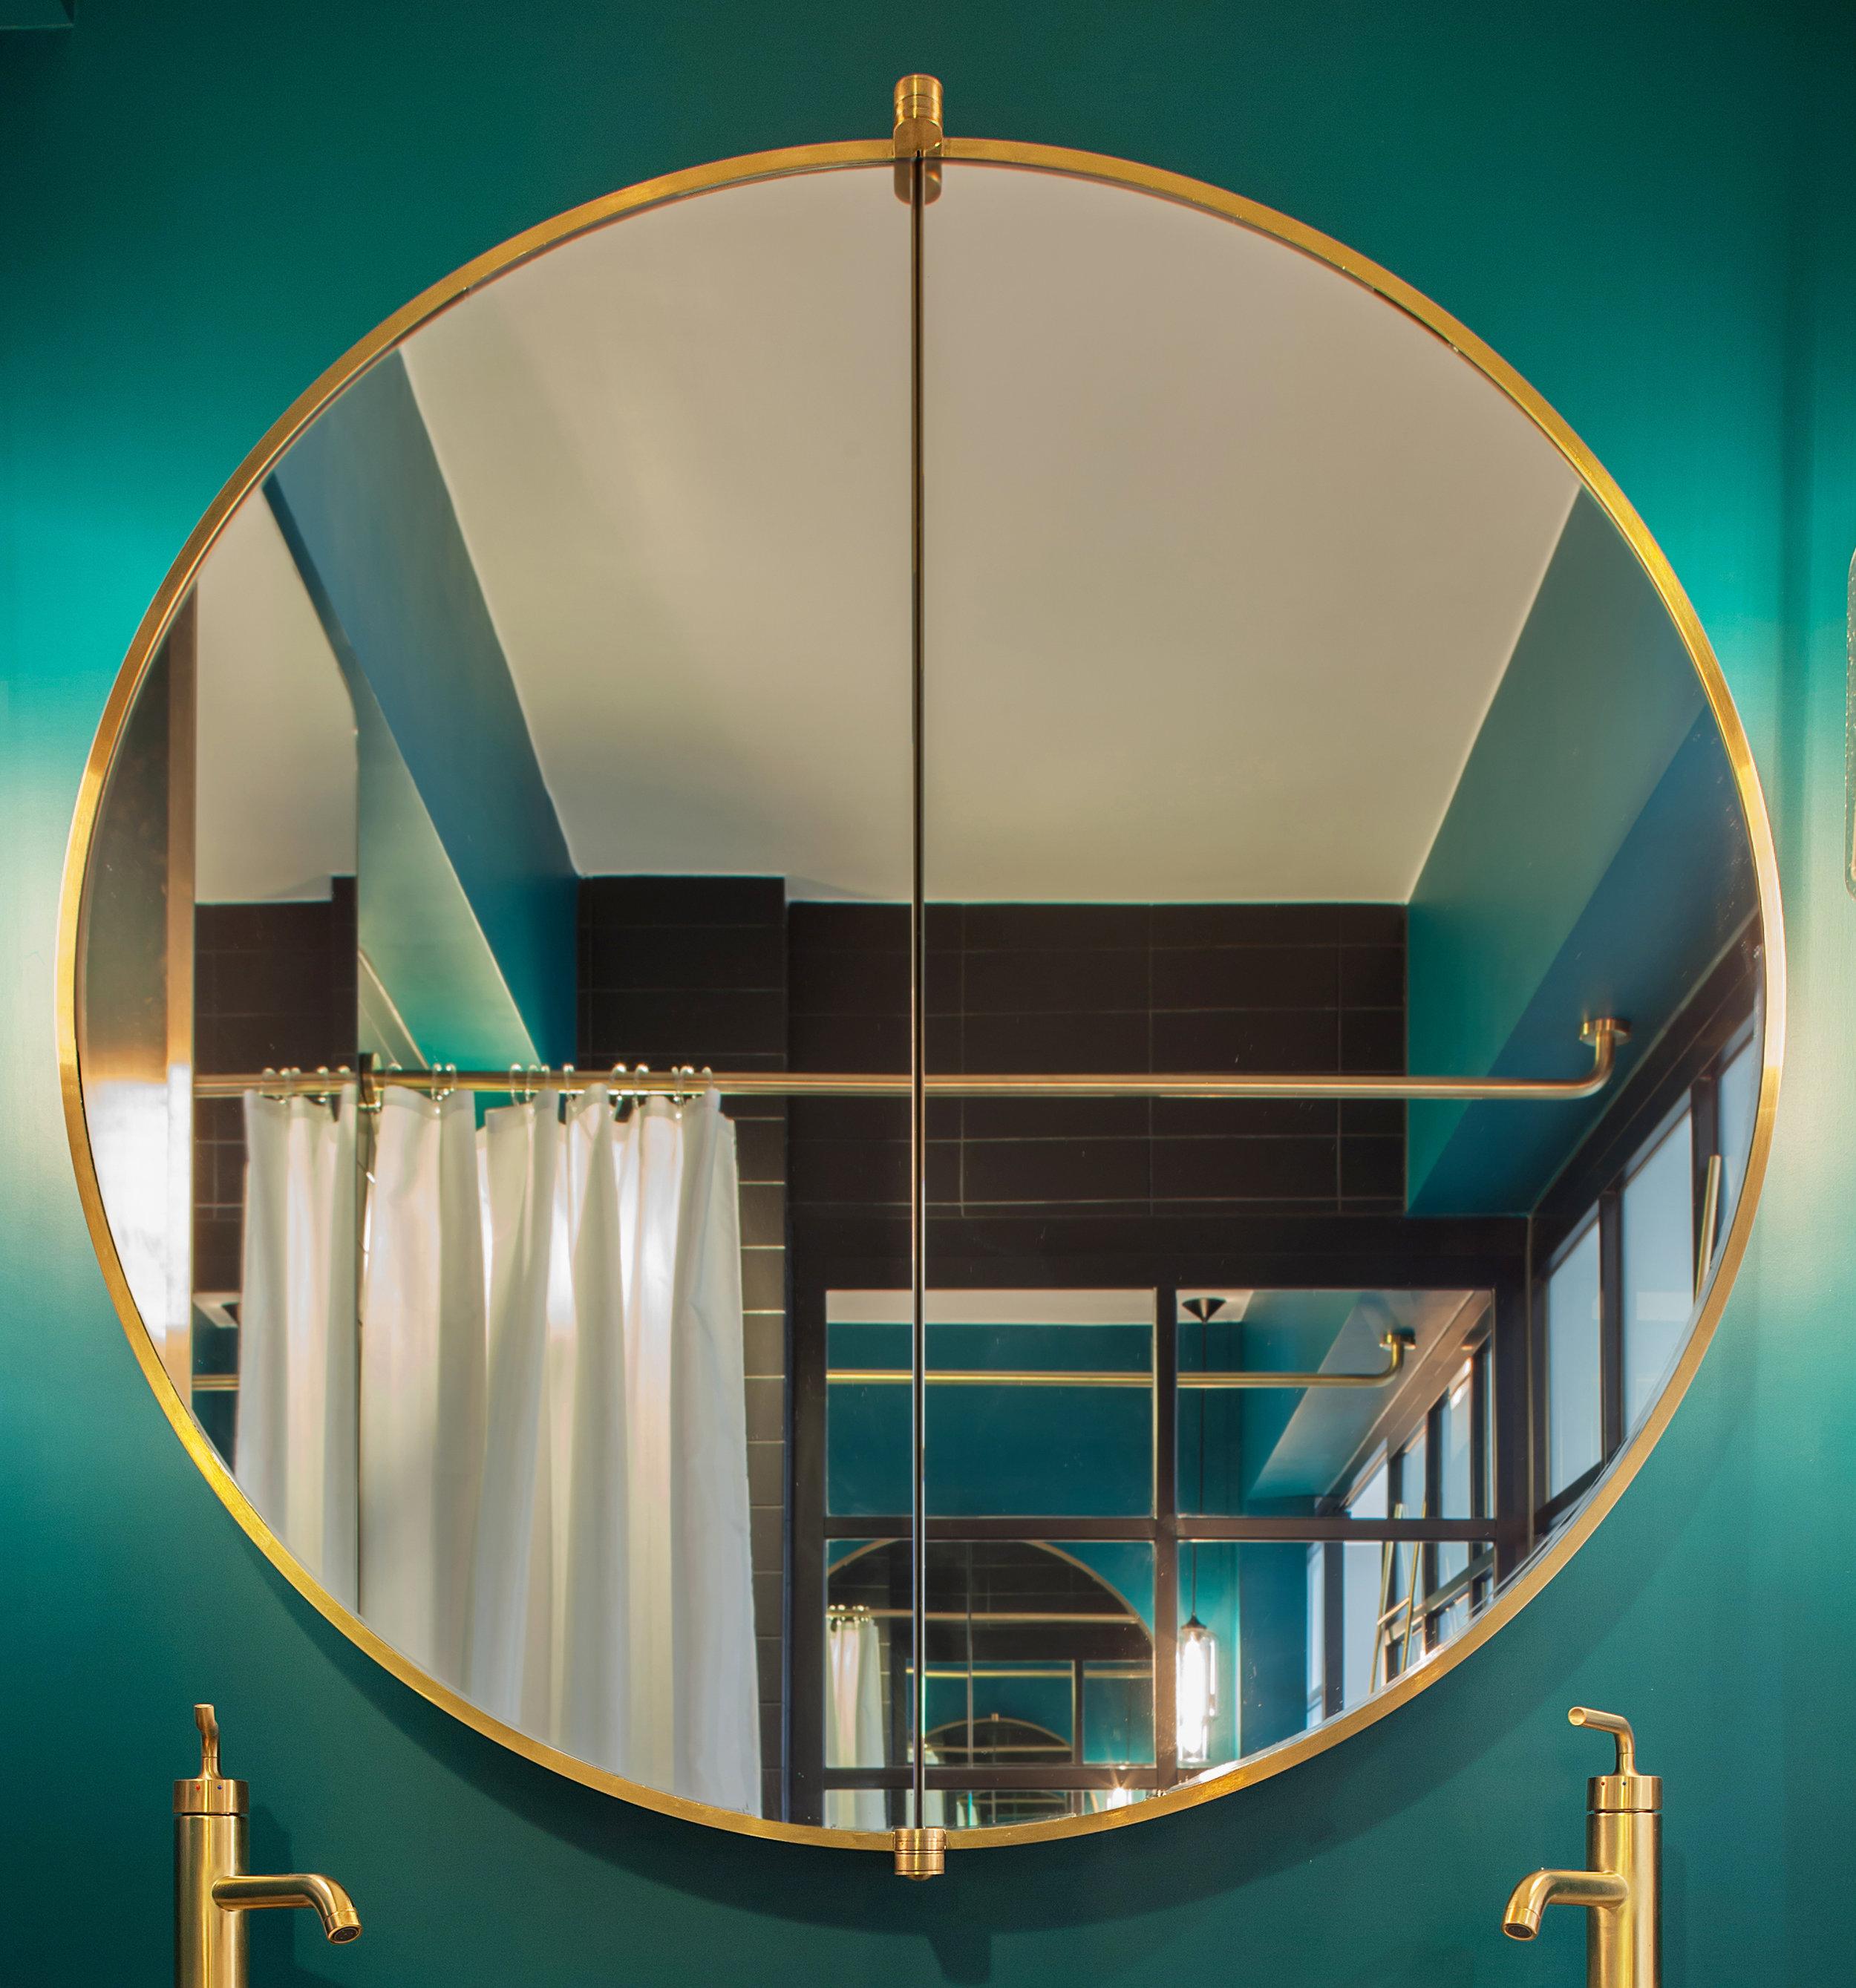 mirror1 copy.jpg